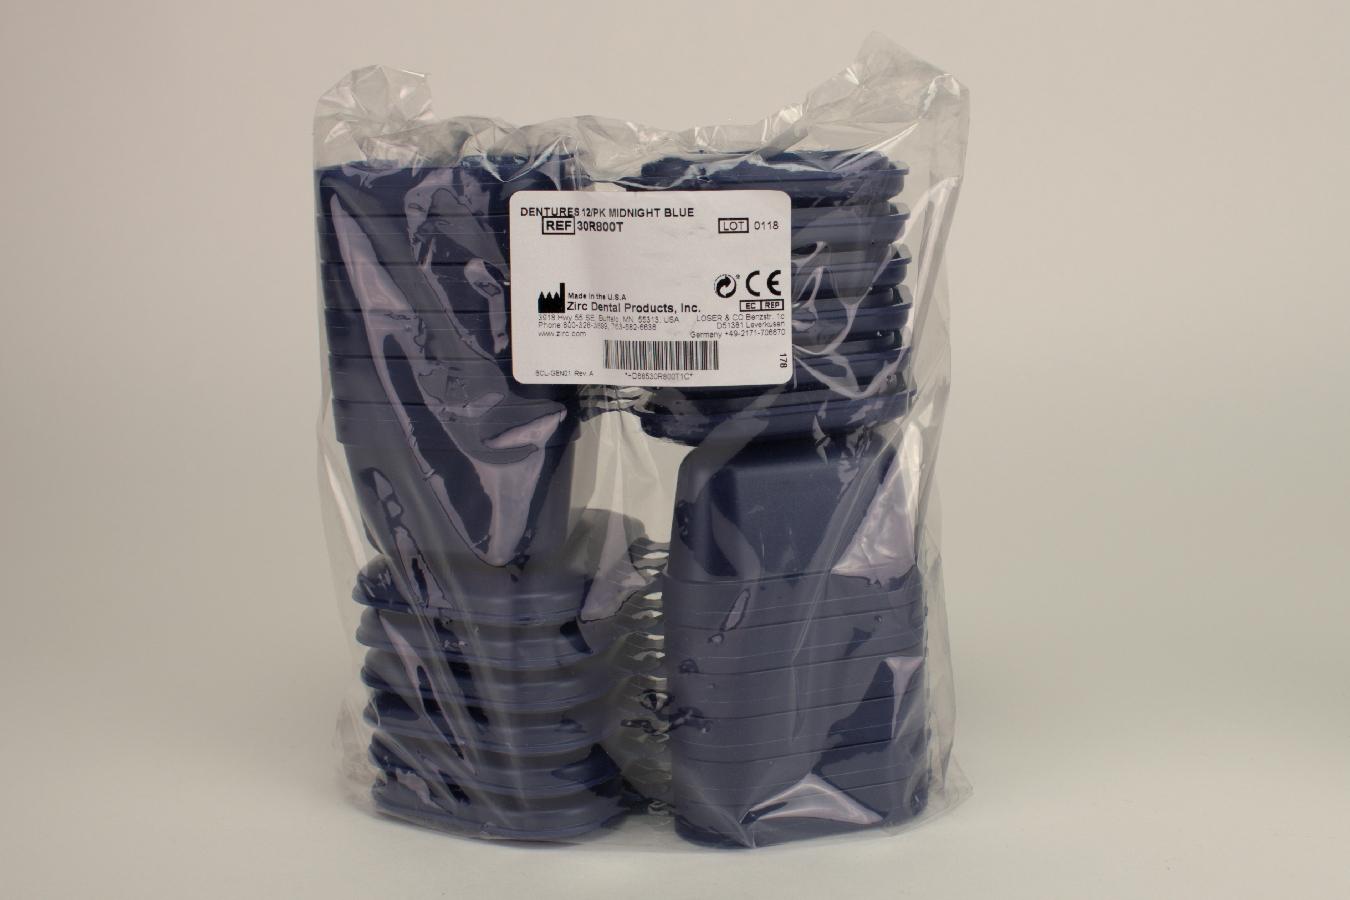 Prothesen-Box dunkelblau 12 Stück